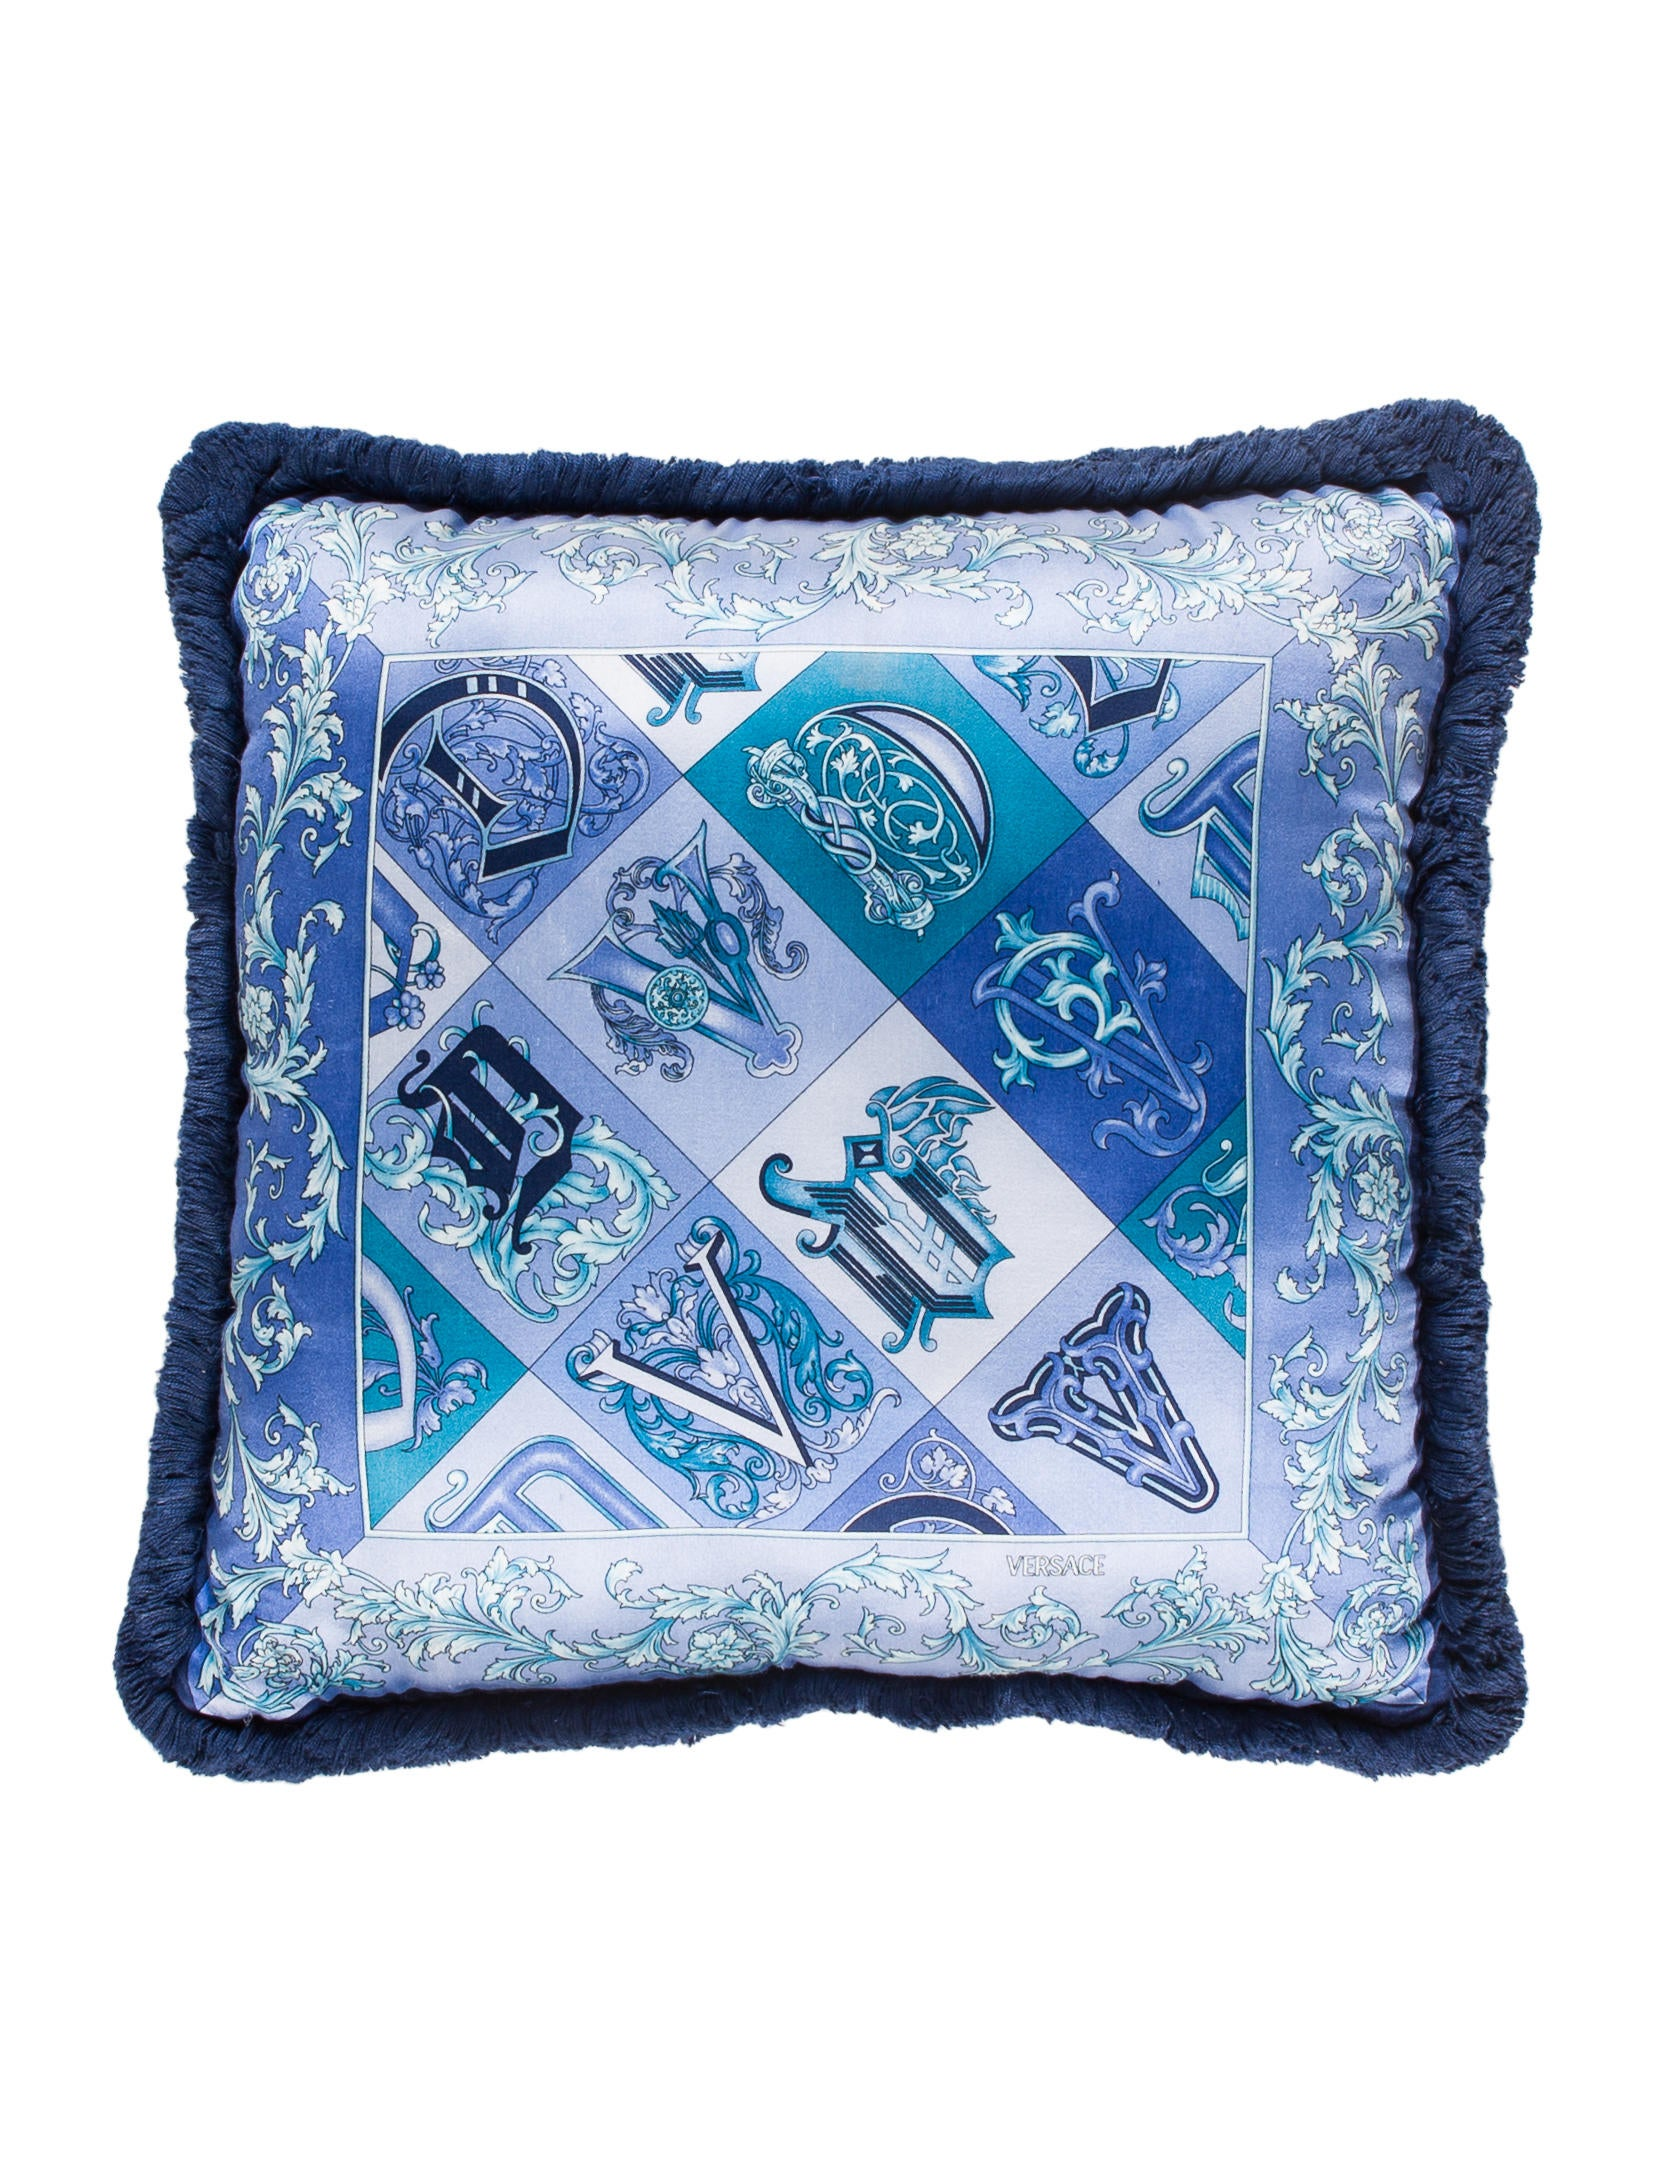 Versace Barocco Throw Pillow - Pillows And Throws - VES30201 The RealReal